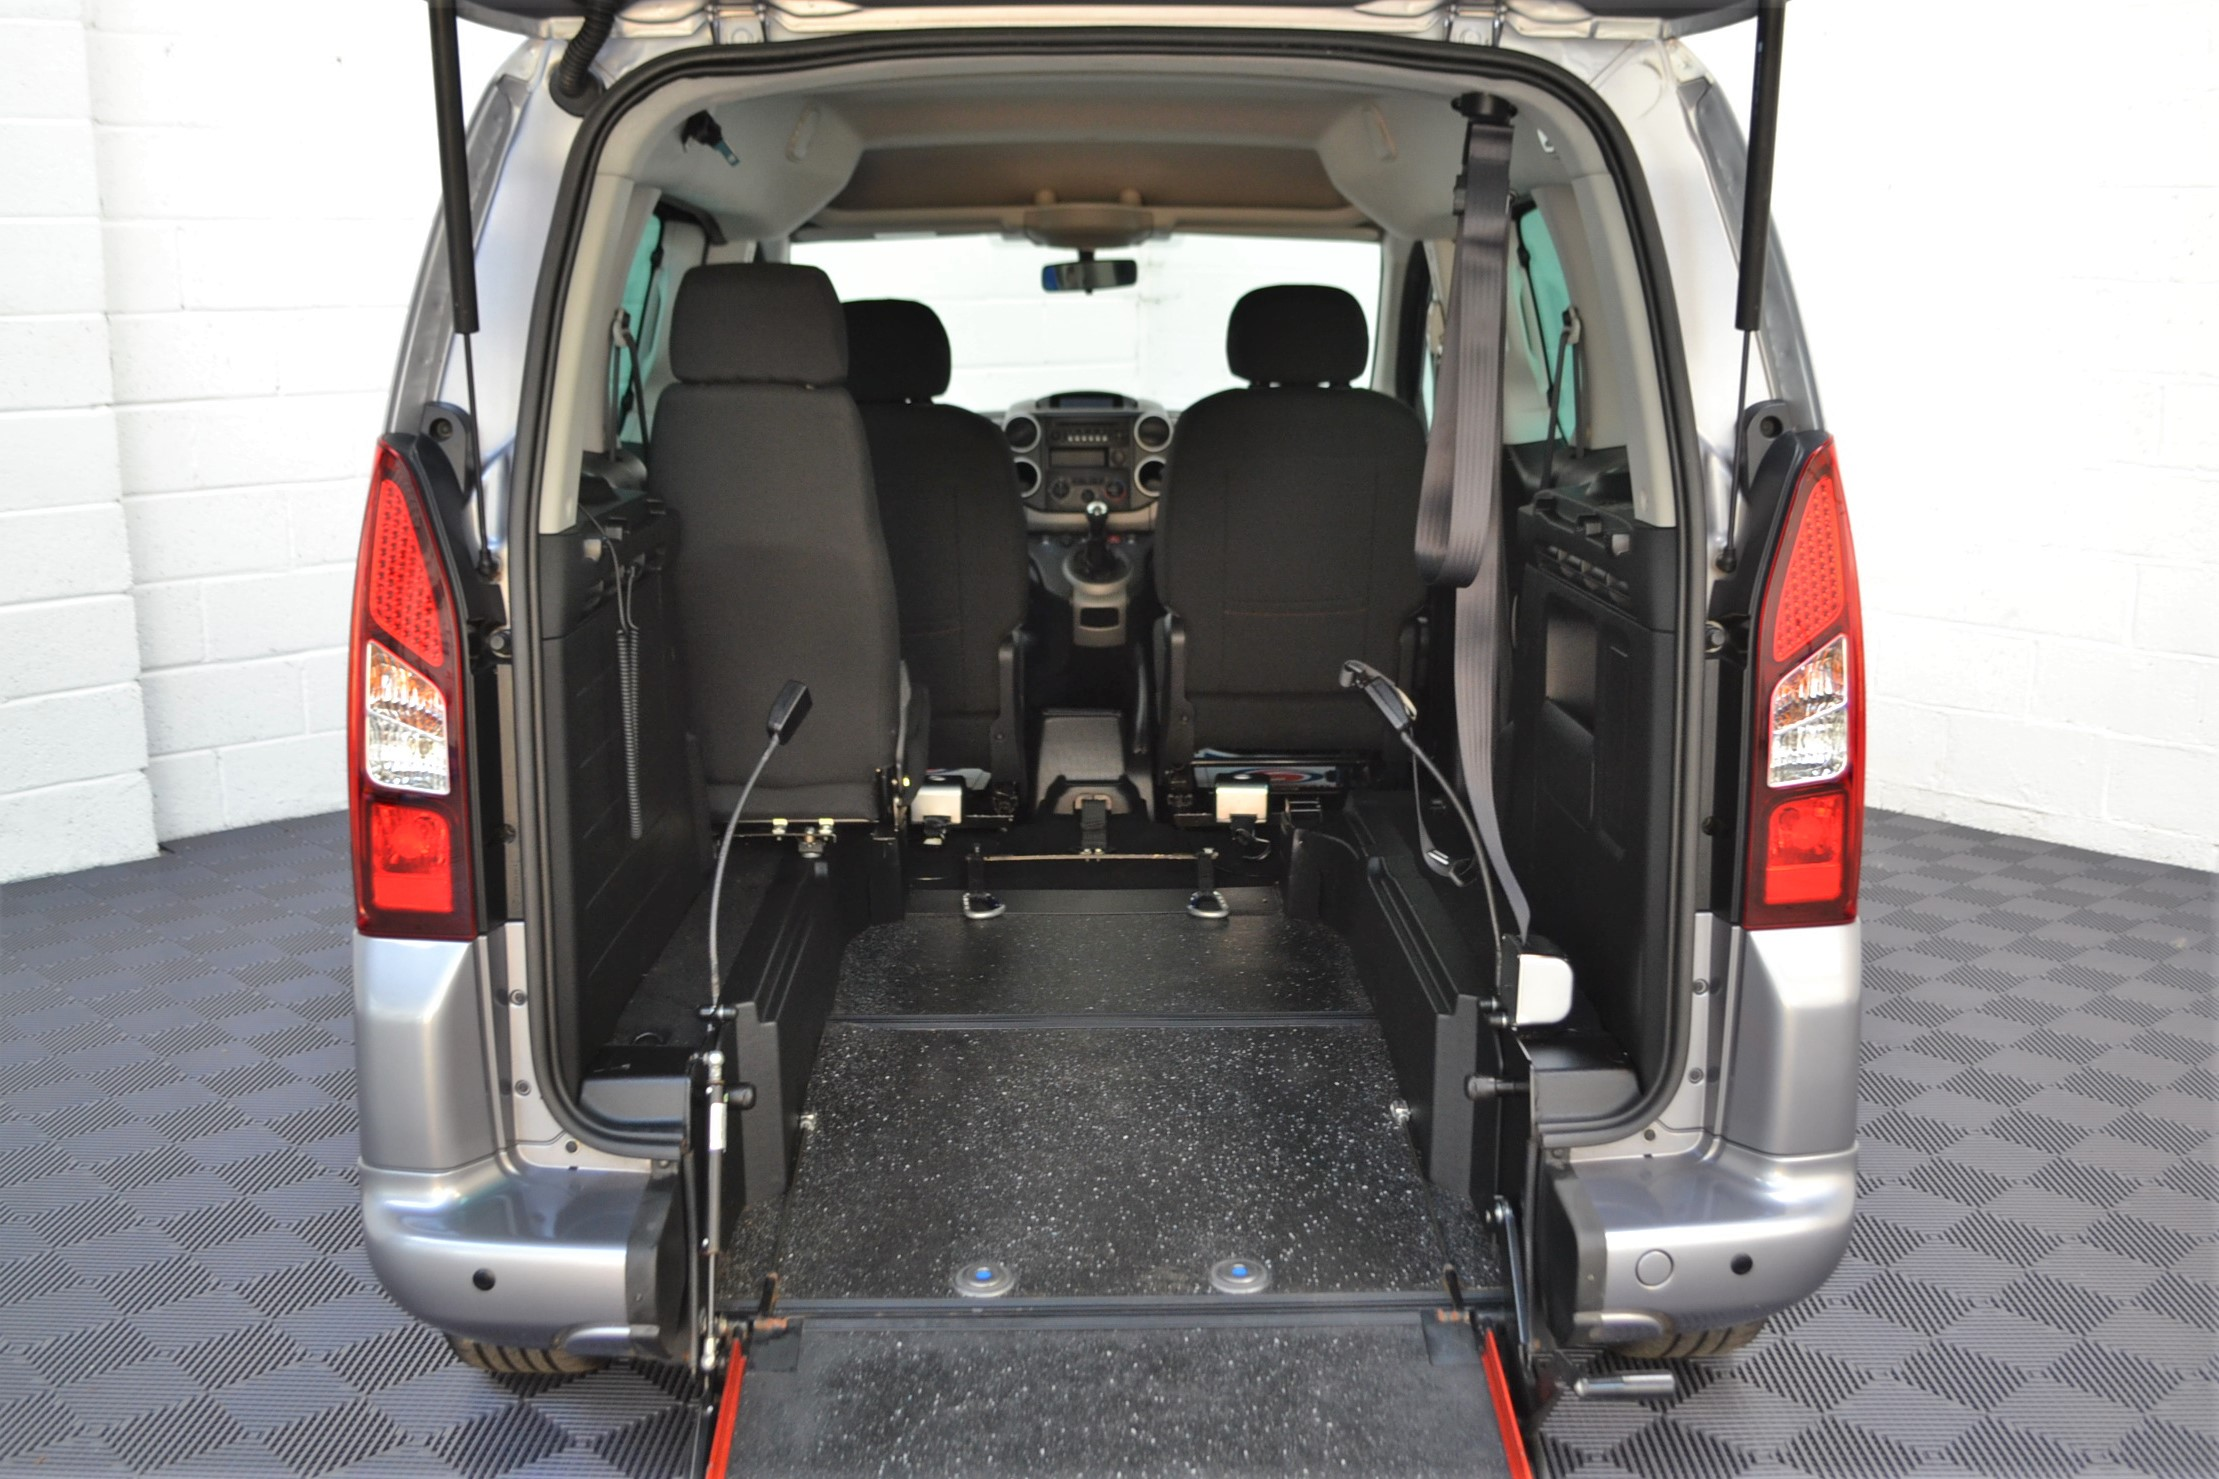 WAV Cars For Sale Bristol Wheelchair Accessible Vehicles Used For Sale Somerset Devon Dorset Bath Peugeot Partner SD17 OZL 9